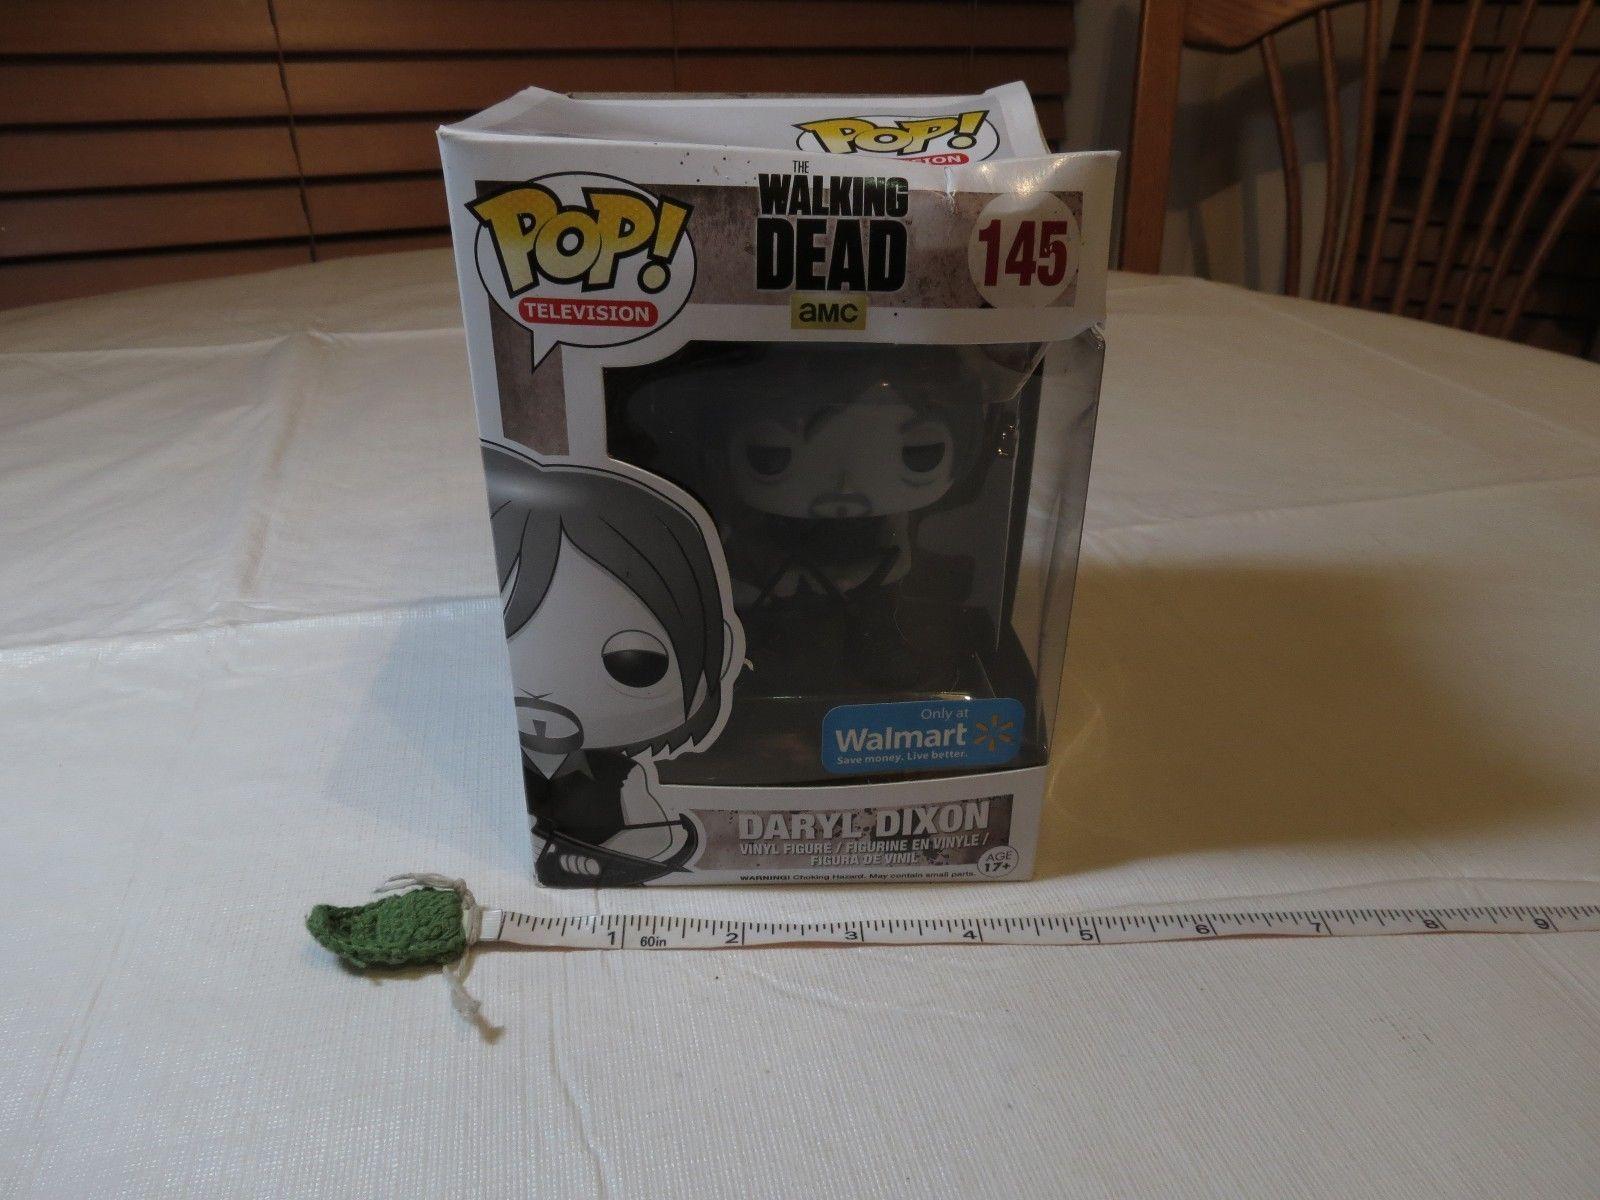 76d5aaa438d 57. 57. Previous. AMC The Walking Dead Daryl Dixon Funko 145 Walmart Pop!  Television black white